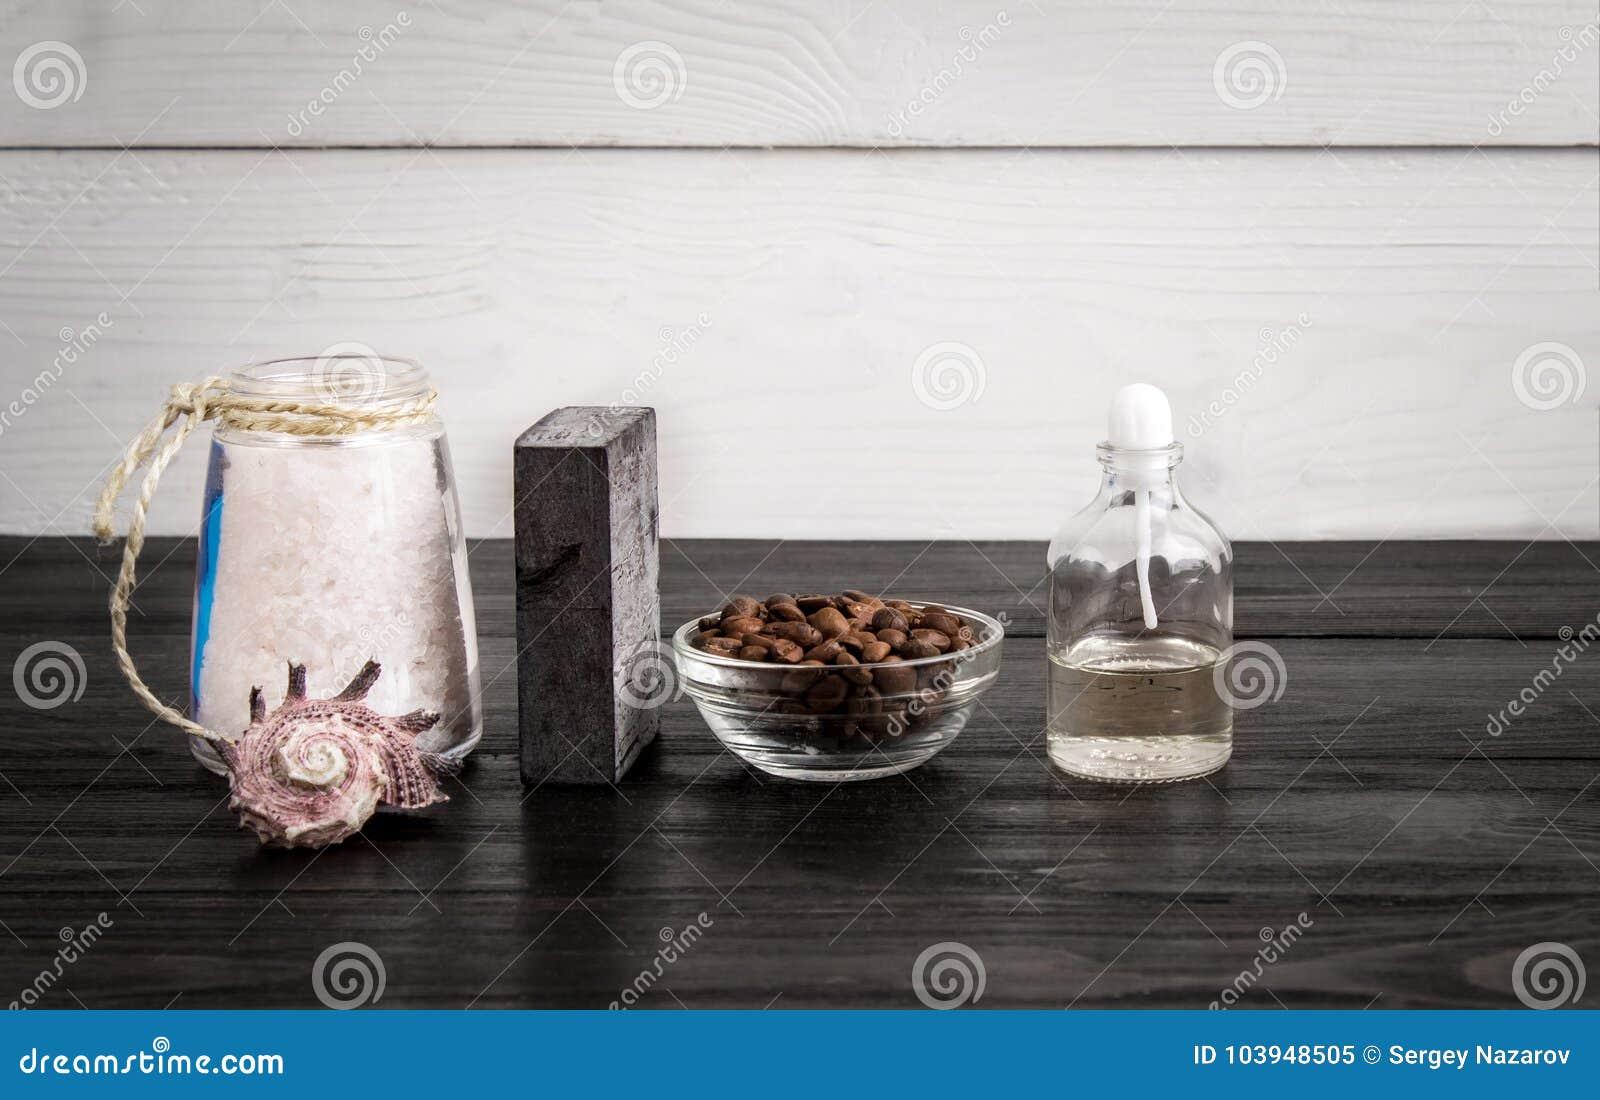 Spa Still Life. Aroma Oils, Stones, Soap, Sea Salt And Coffee Beans ...